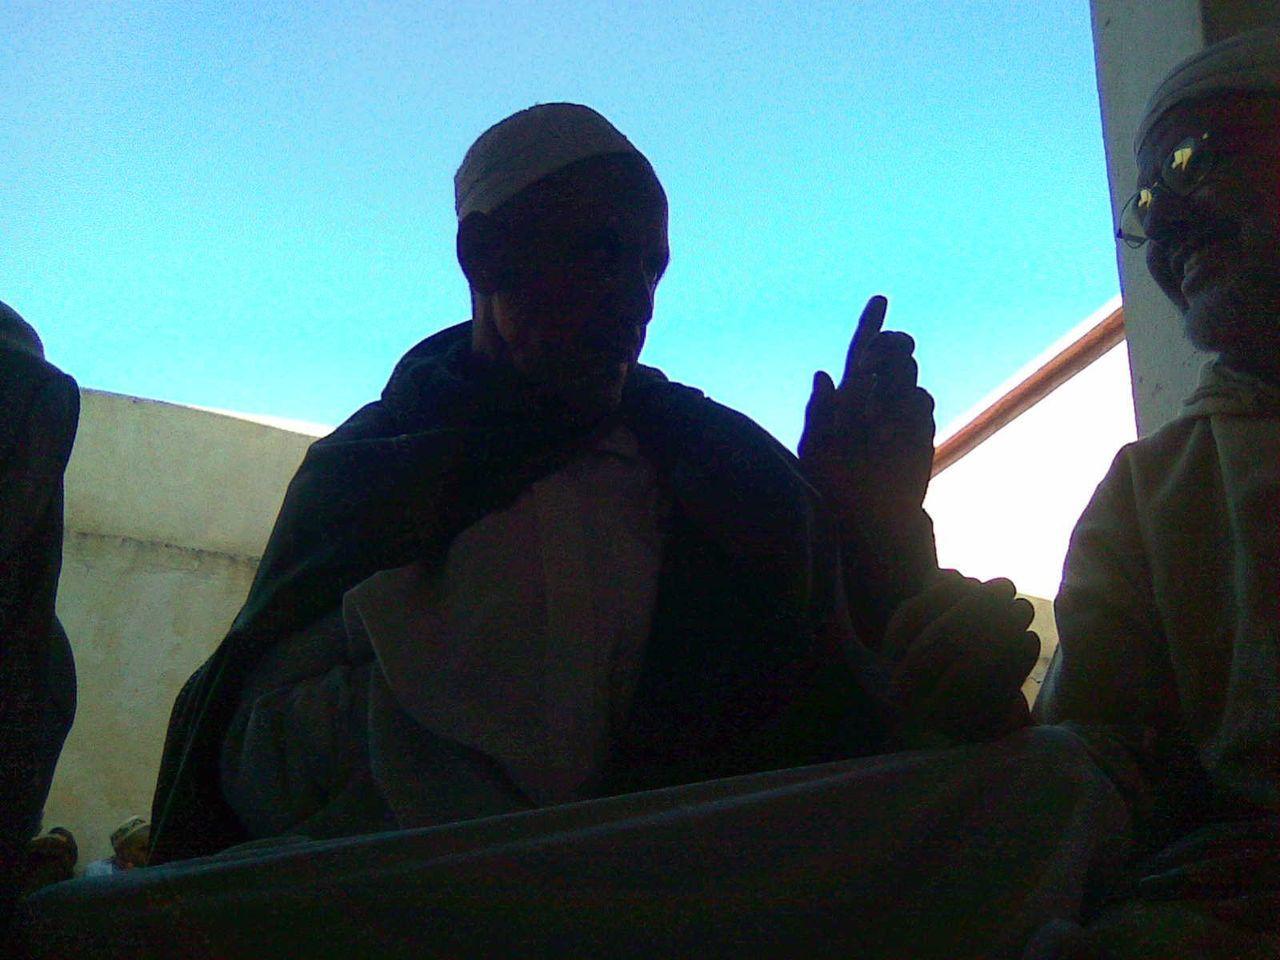 conversation of berber men Arabic Berber  Clothes Djellaba Folklore Friendship Islam Leisure Activity Morocco Tamazight Tighmi Tiznit Togetherness